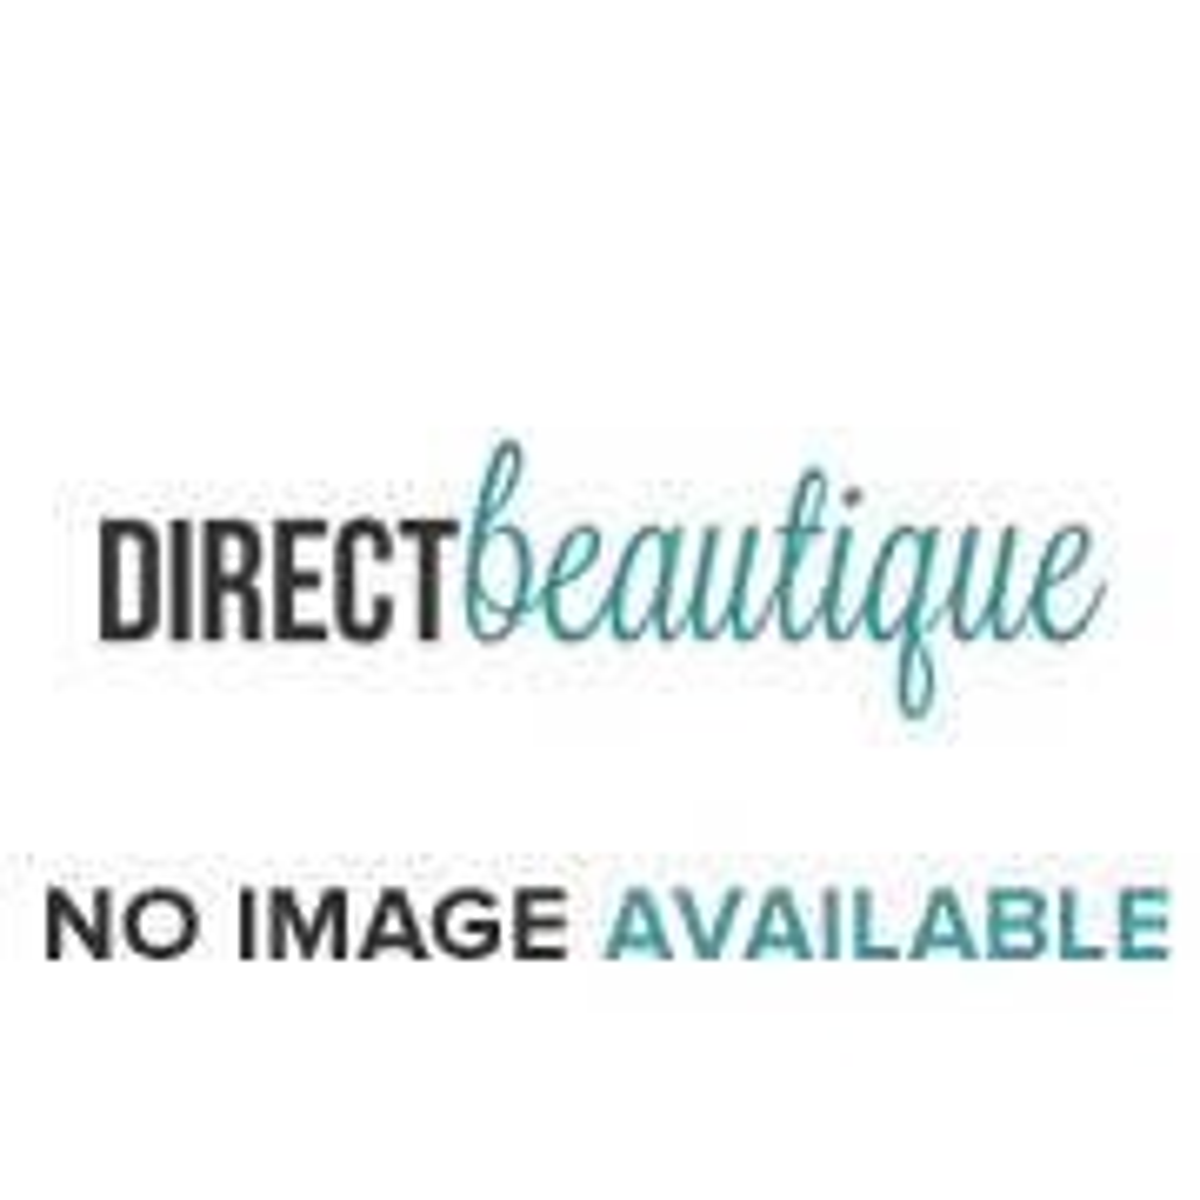 L'Oreal Loreal Magic Retouch Chatain  75ml